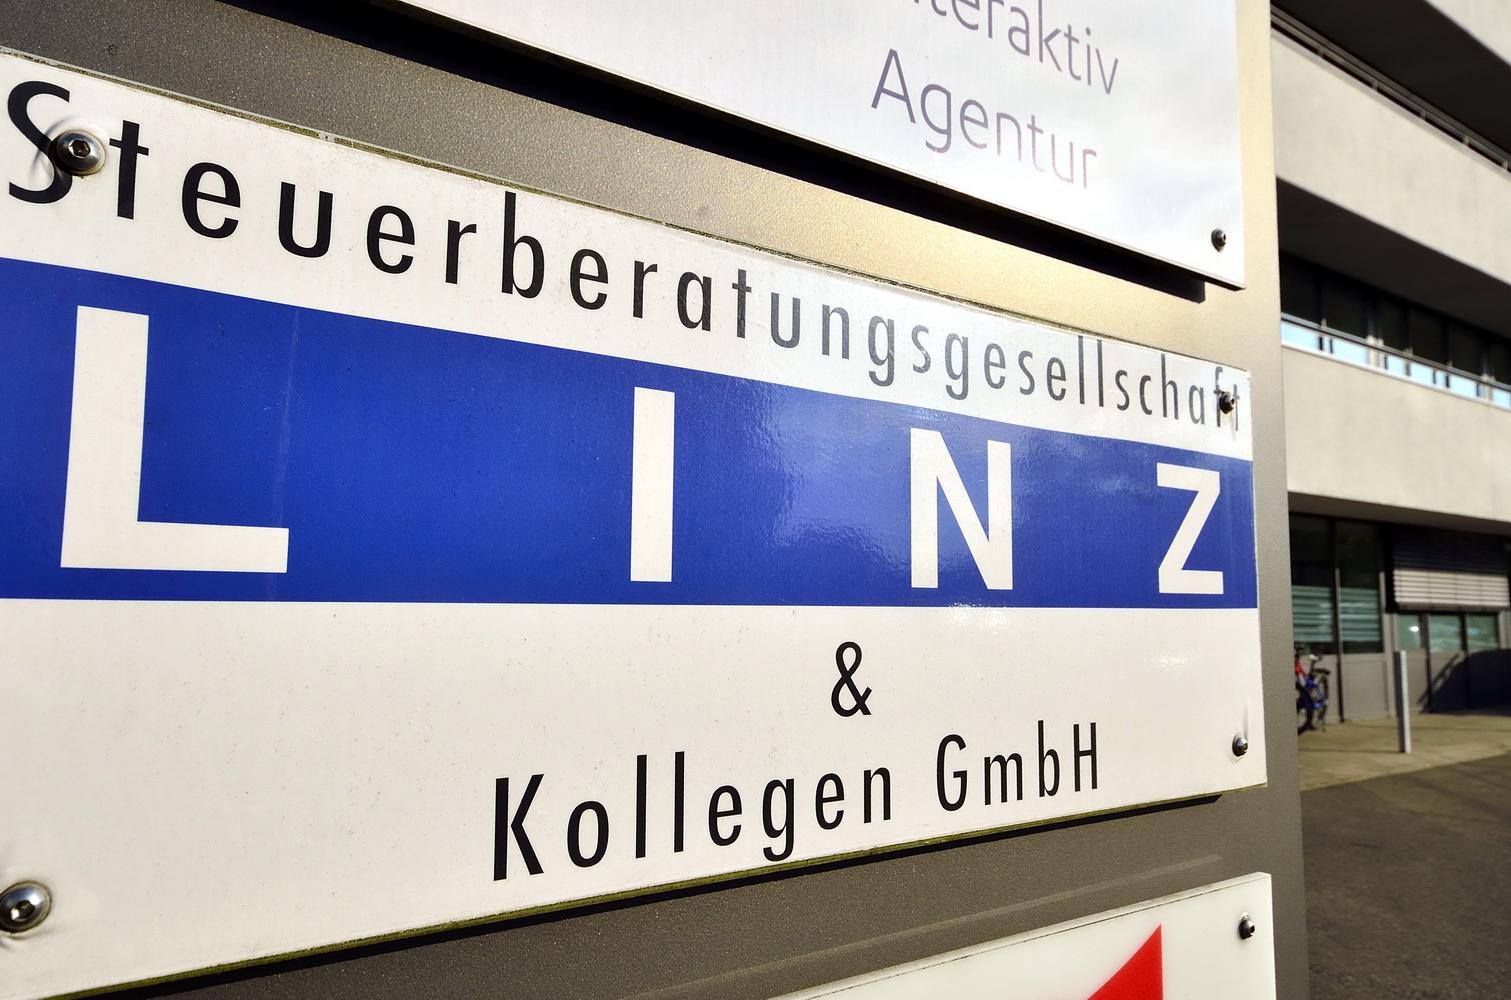 Steuerbüro Linz